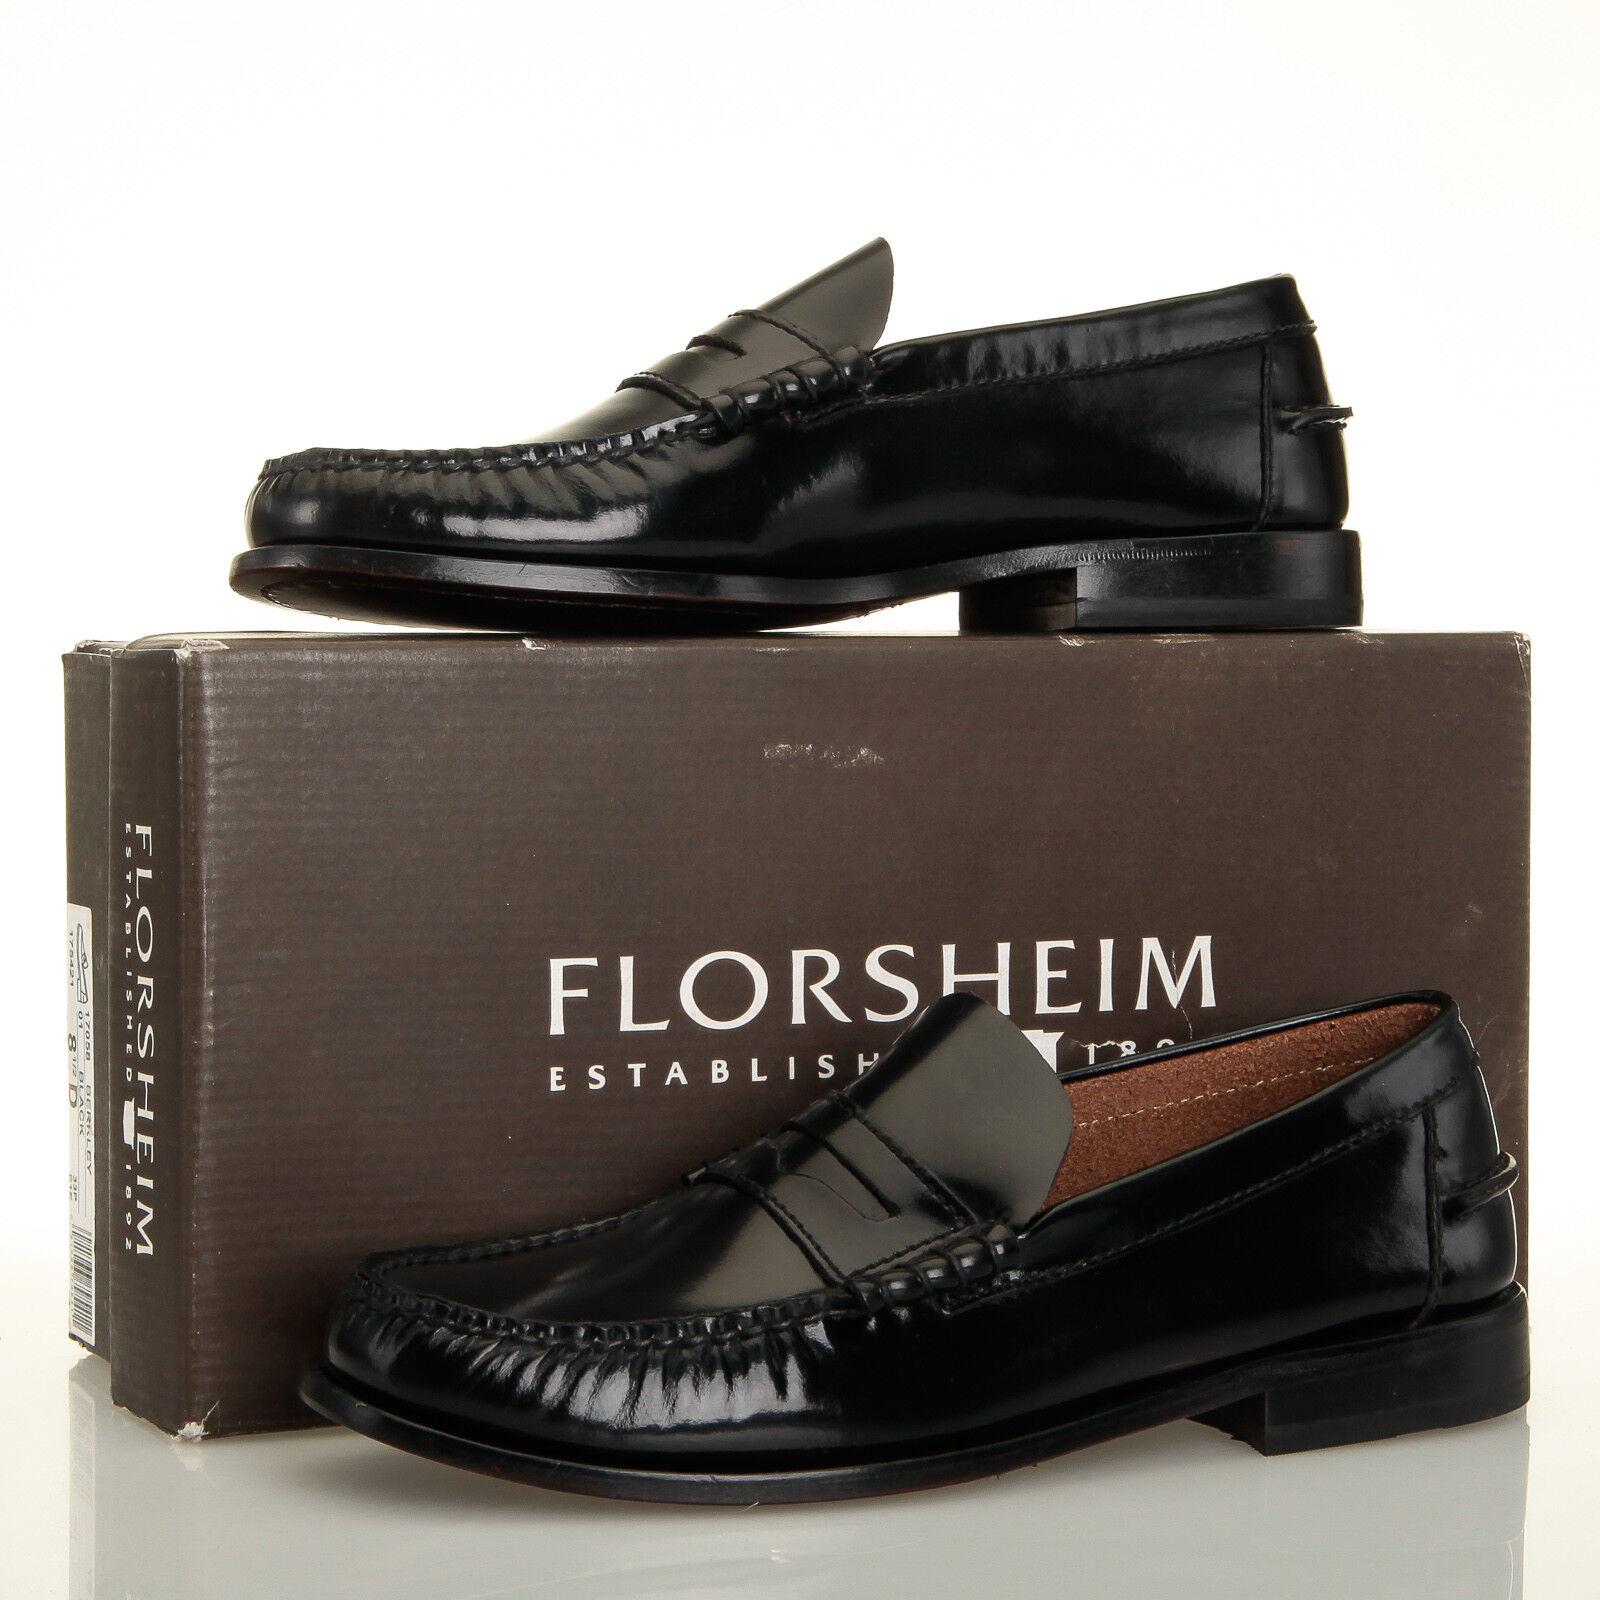 Florsheim Imperial en cuir noir Berkley Moc Toe Penny Mocassins-Homme 8.5 D